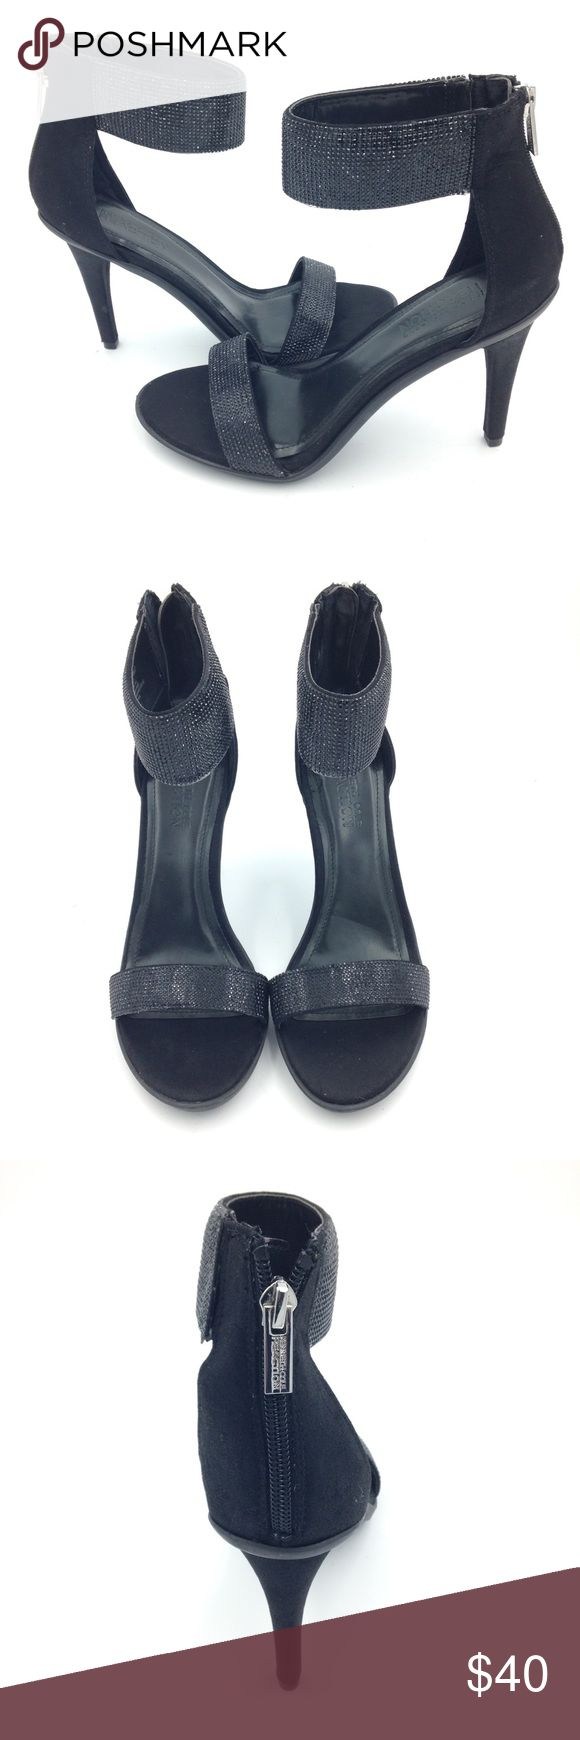 New Women's Black Rhinestone Kenneth Cole heels New Black Pixie Glitter Kenneth Cole heels with zipper back, Kenneth Cole Shoes Heels